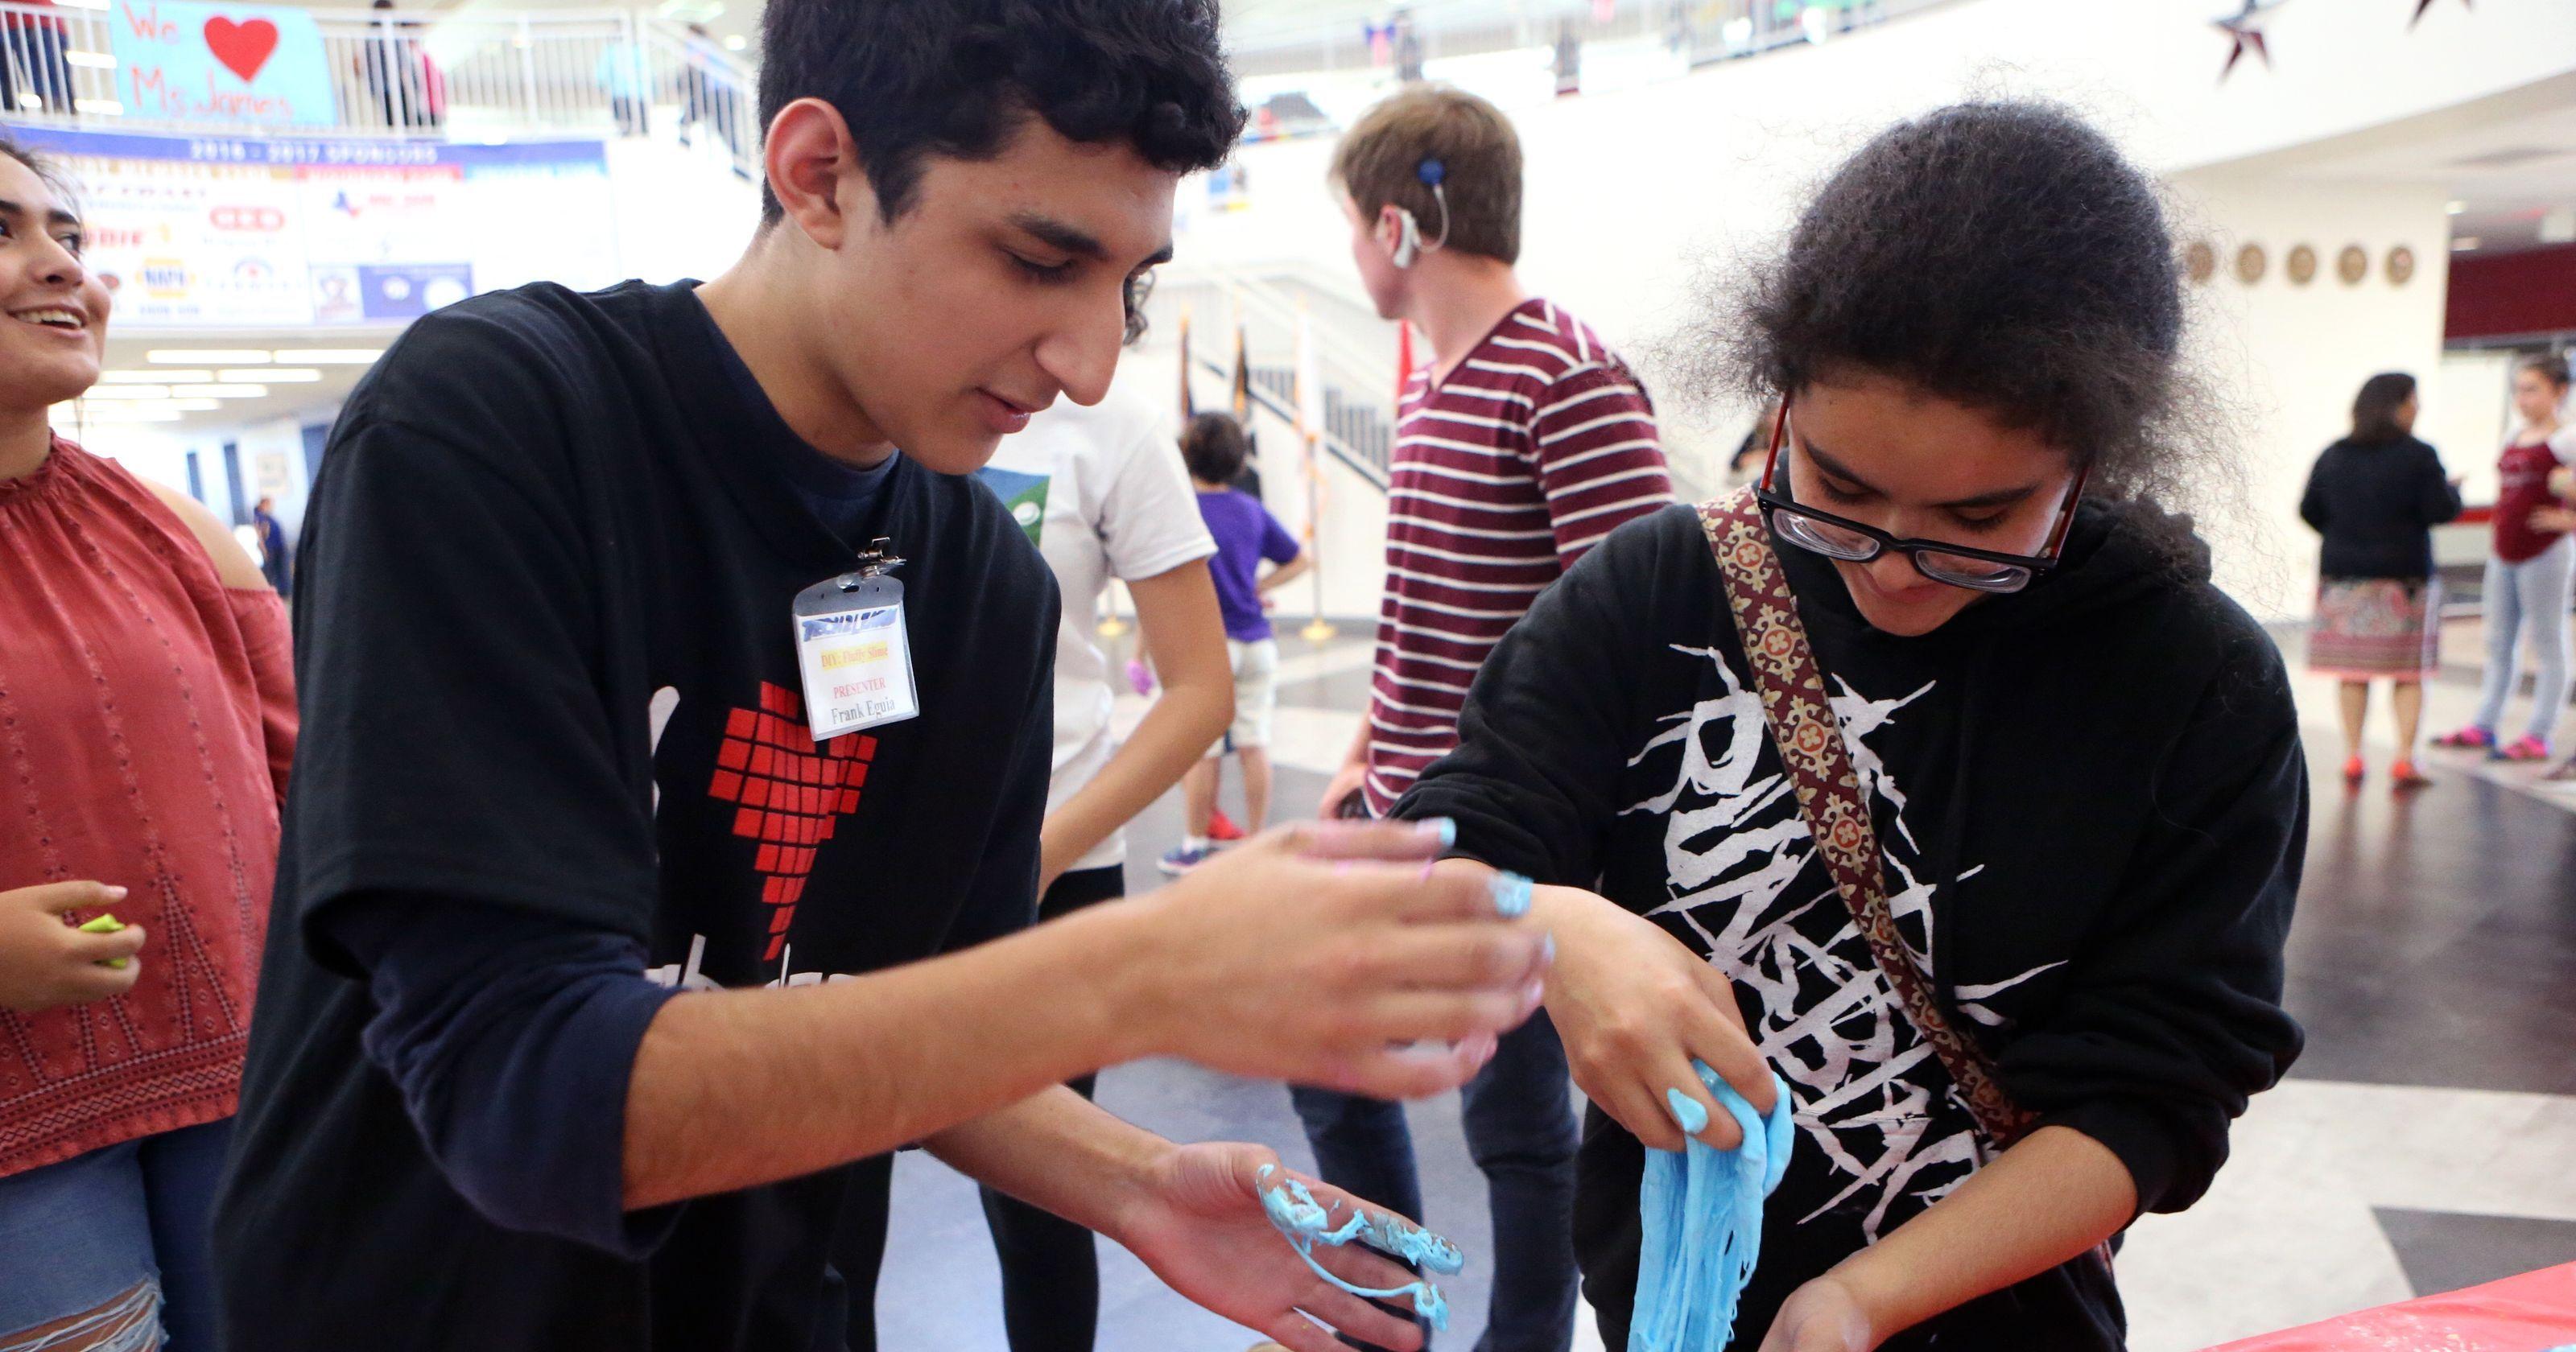 Digital creativity on display for Multimedia Fair